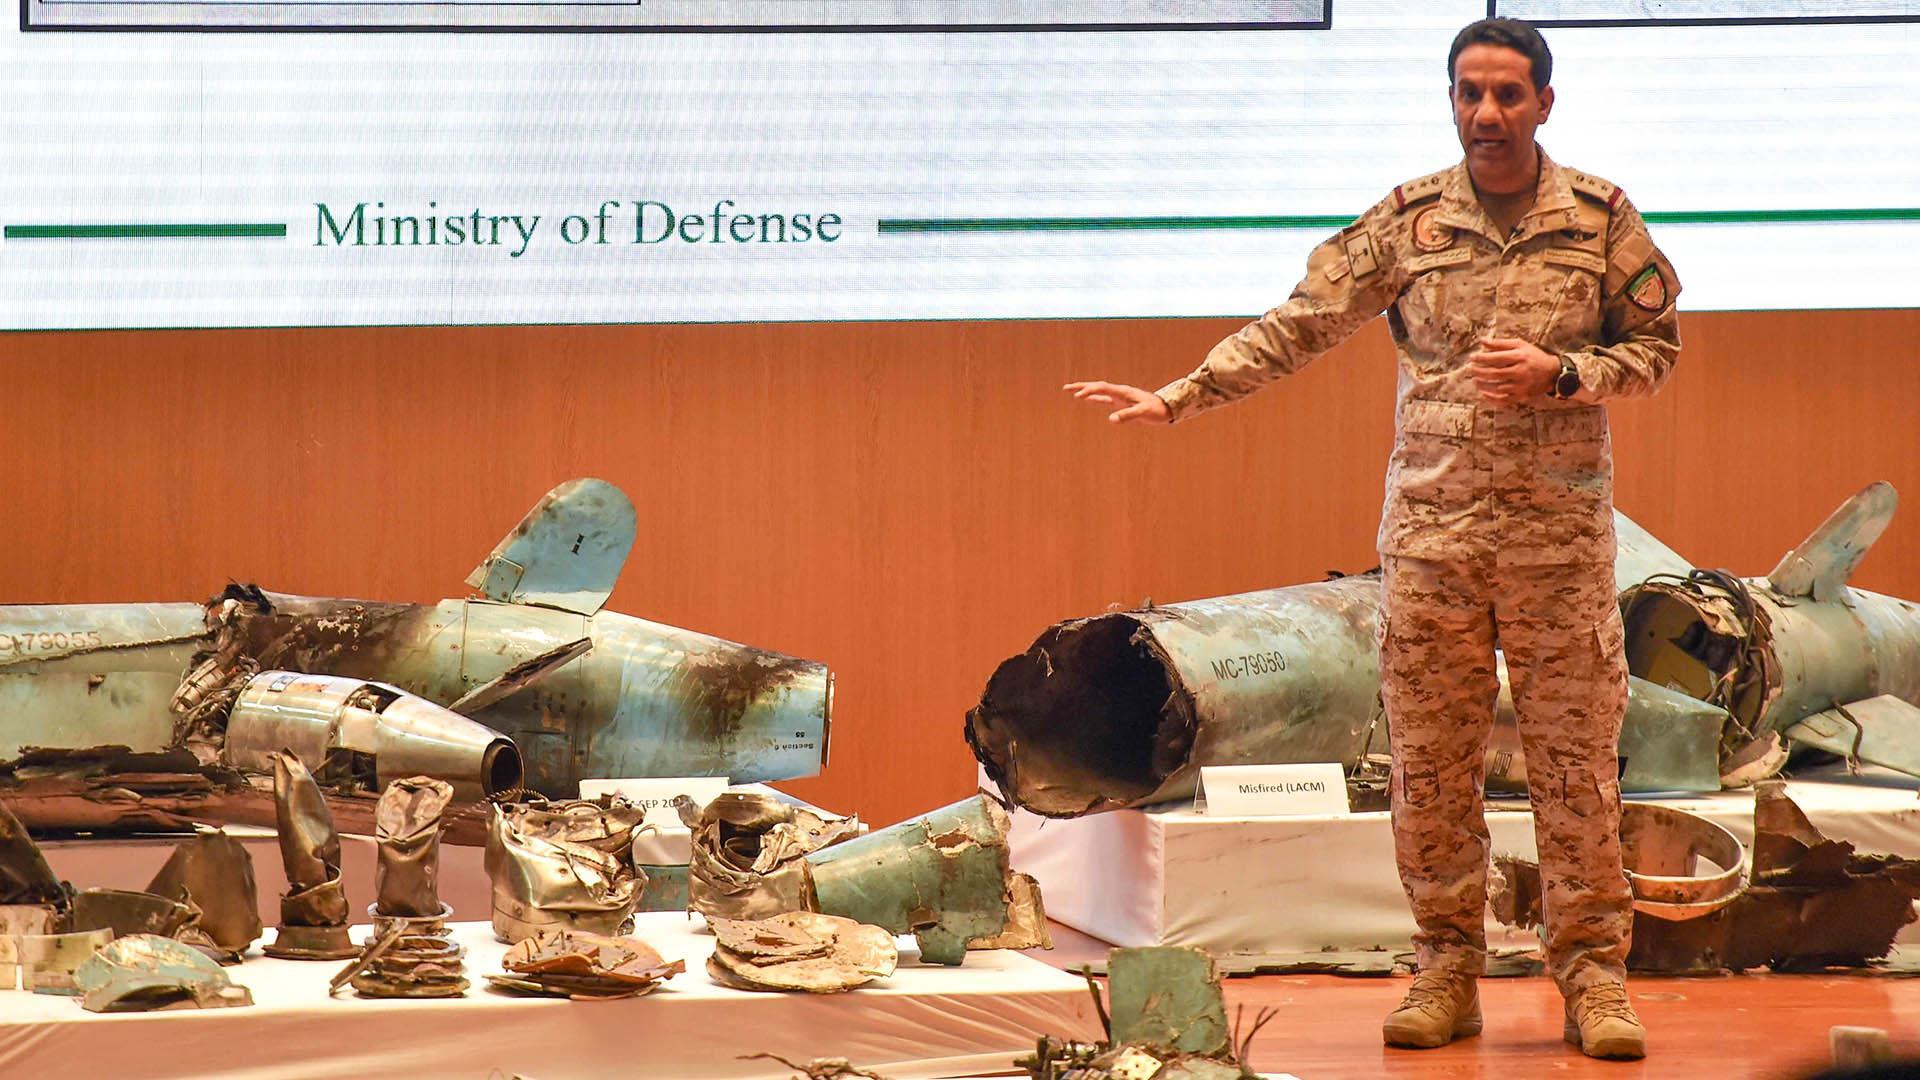 Saudi Arabia shows drone and missile wreckage, blames Iran for oil facility attacks